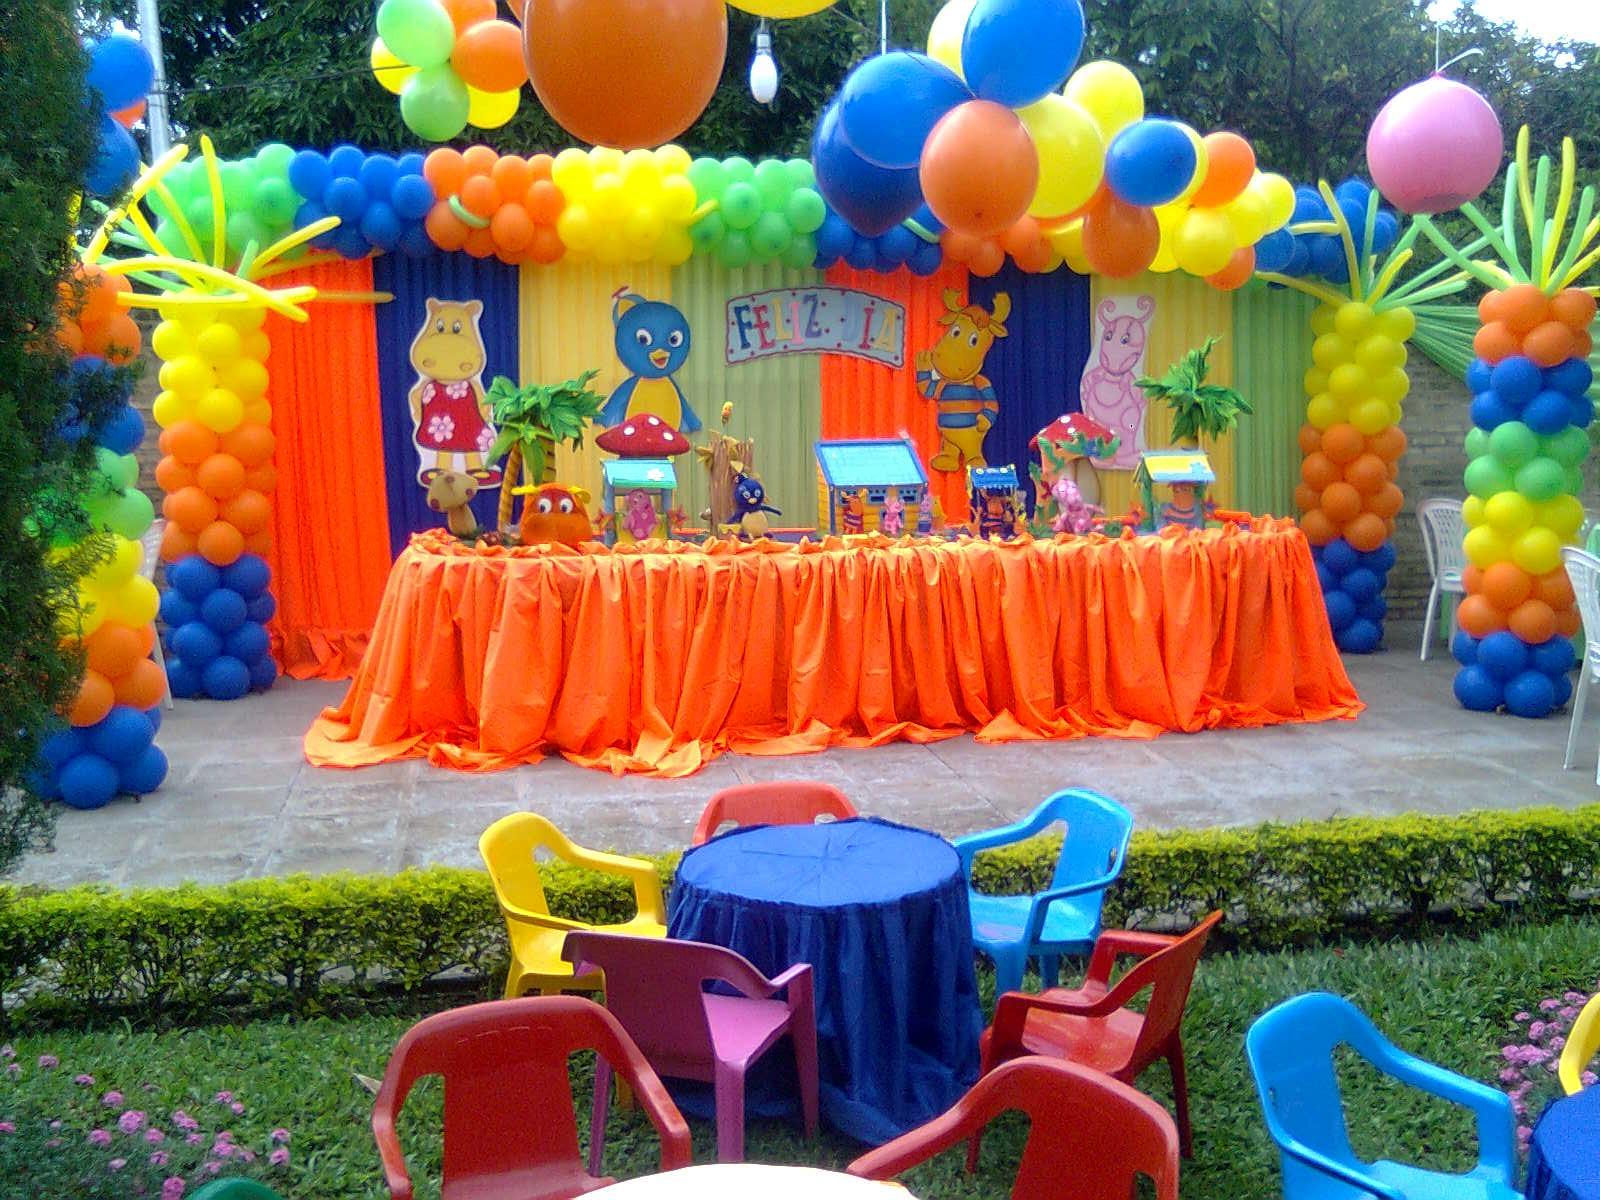 A y p fiestas decoracion de cumplea os infantiles - Decorar cumpleanos infantil ...